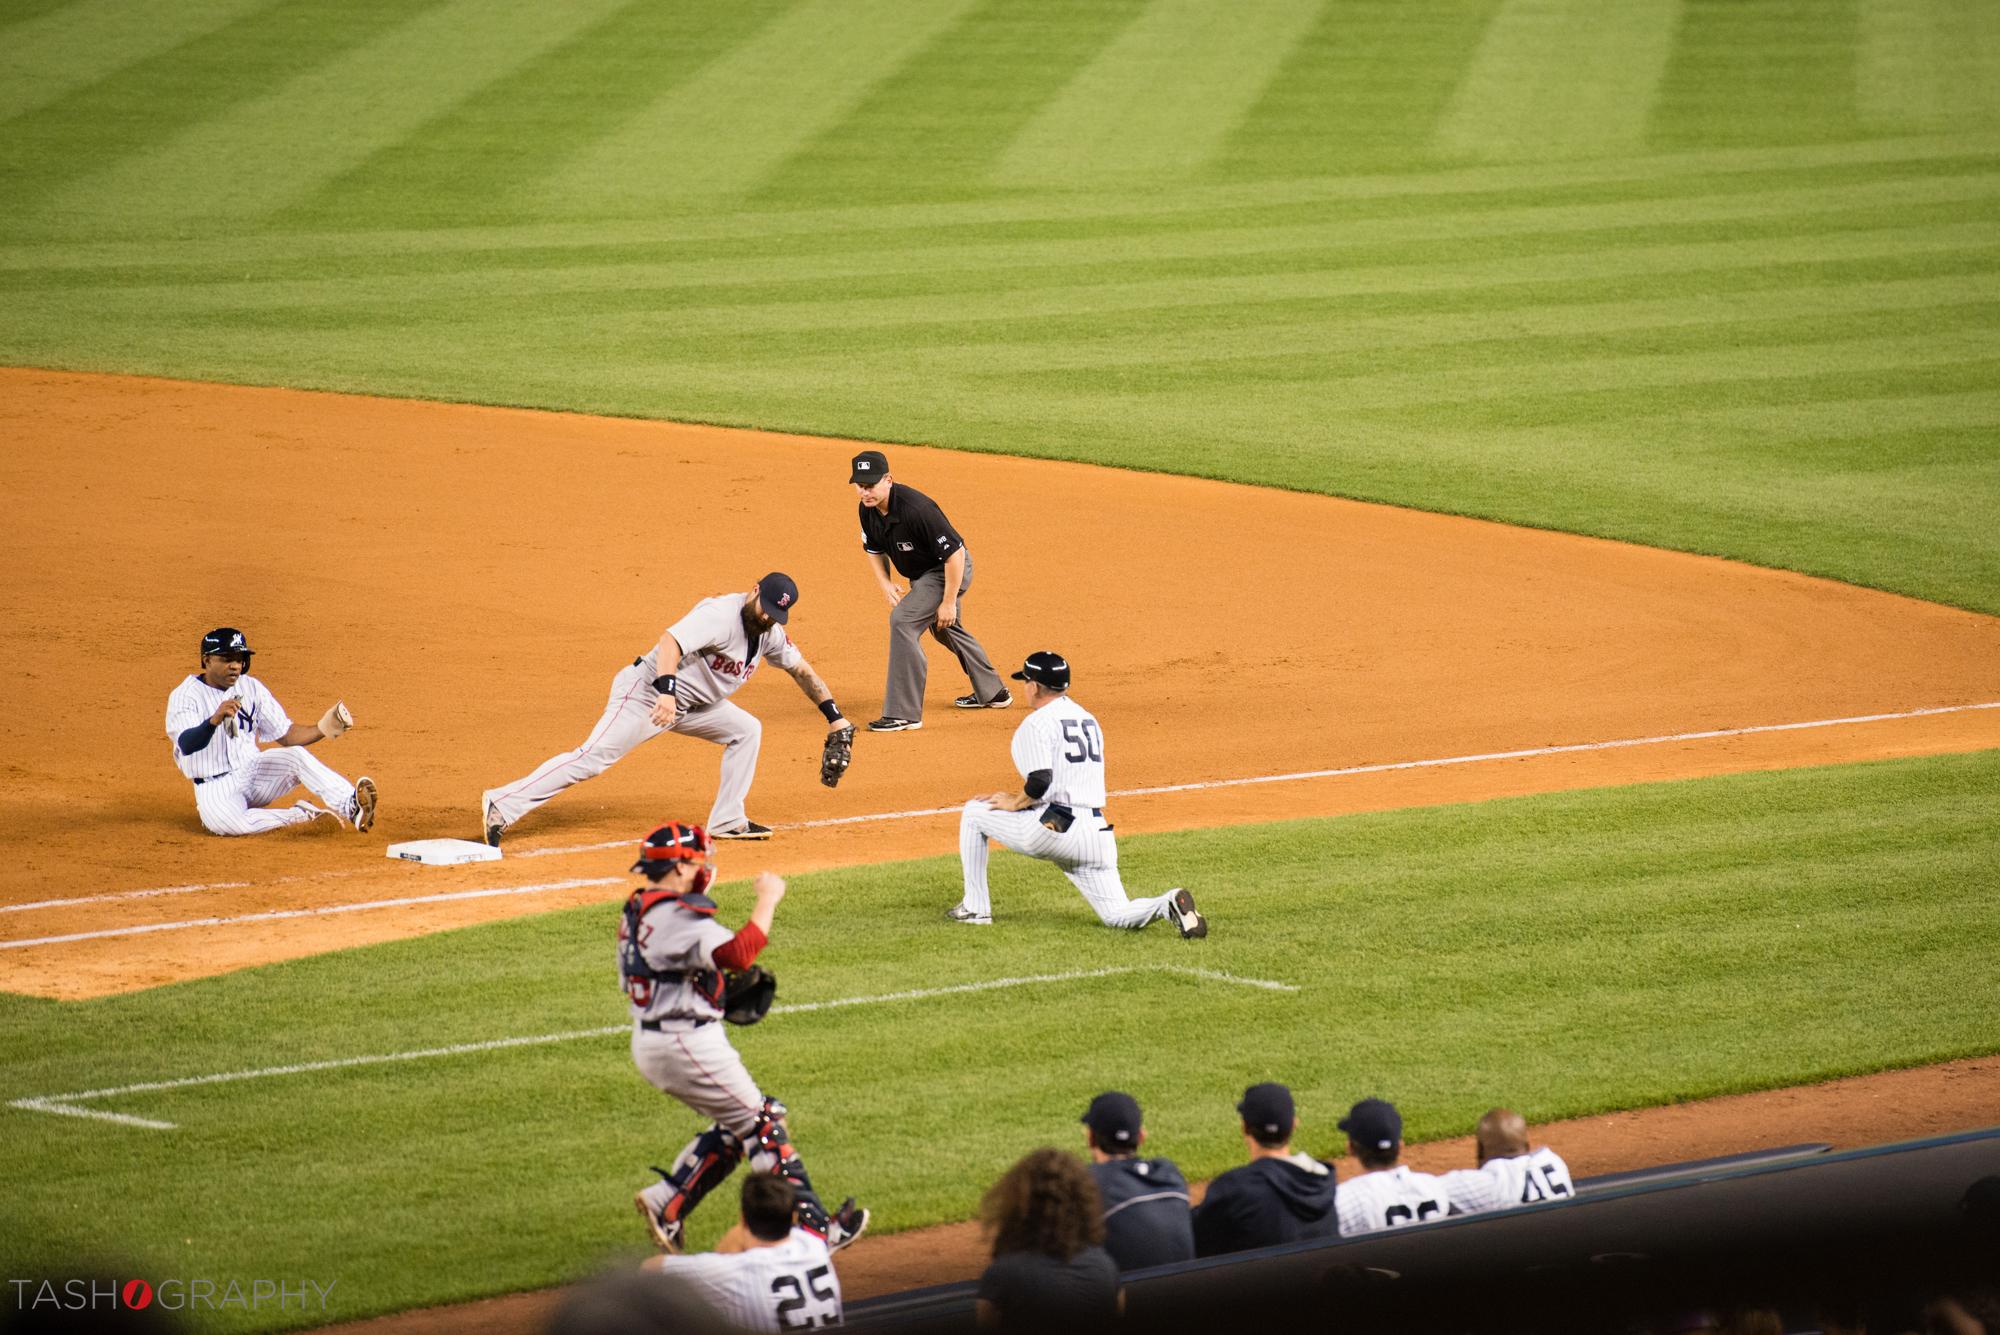 Yankees-090314-43.jpg